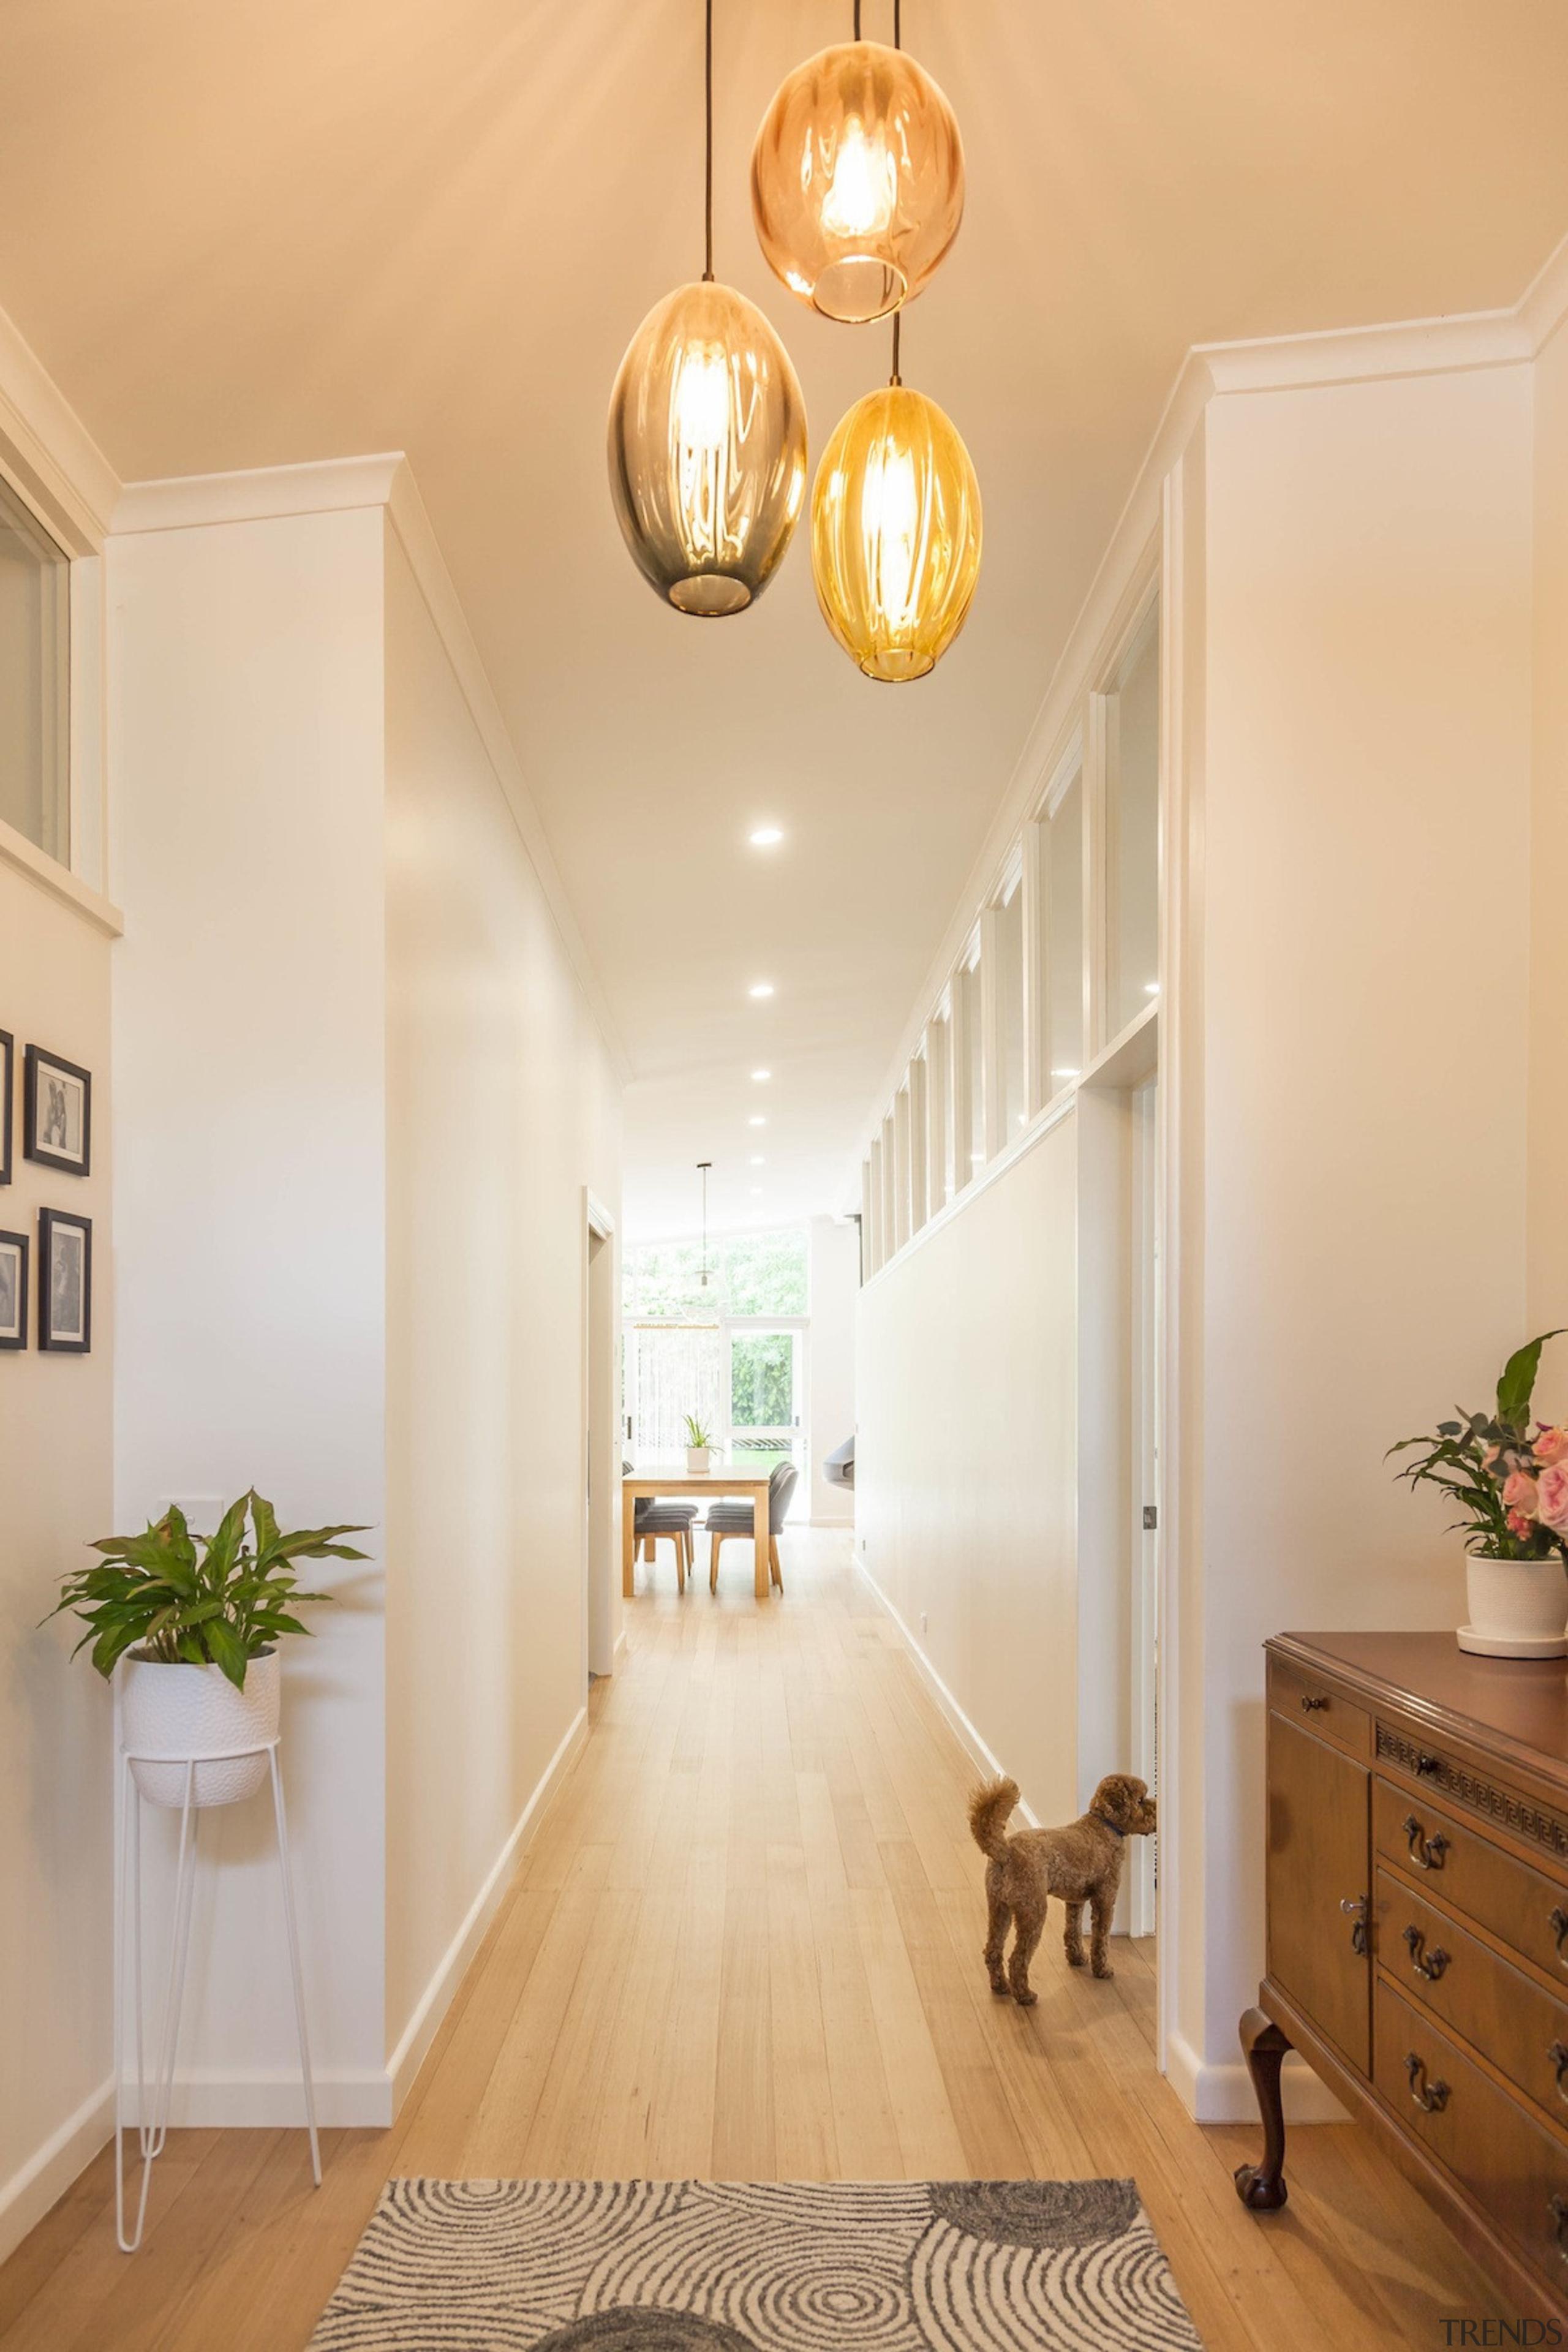 A light arrangement in the hallway - A ceiling, daylighting, floor, flooring, hardwood, home, interior design, lighting, living room, molding, real estate, room, wall, window, wood, wood flooring, orange, white